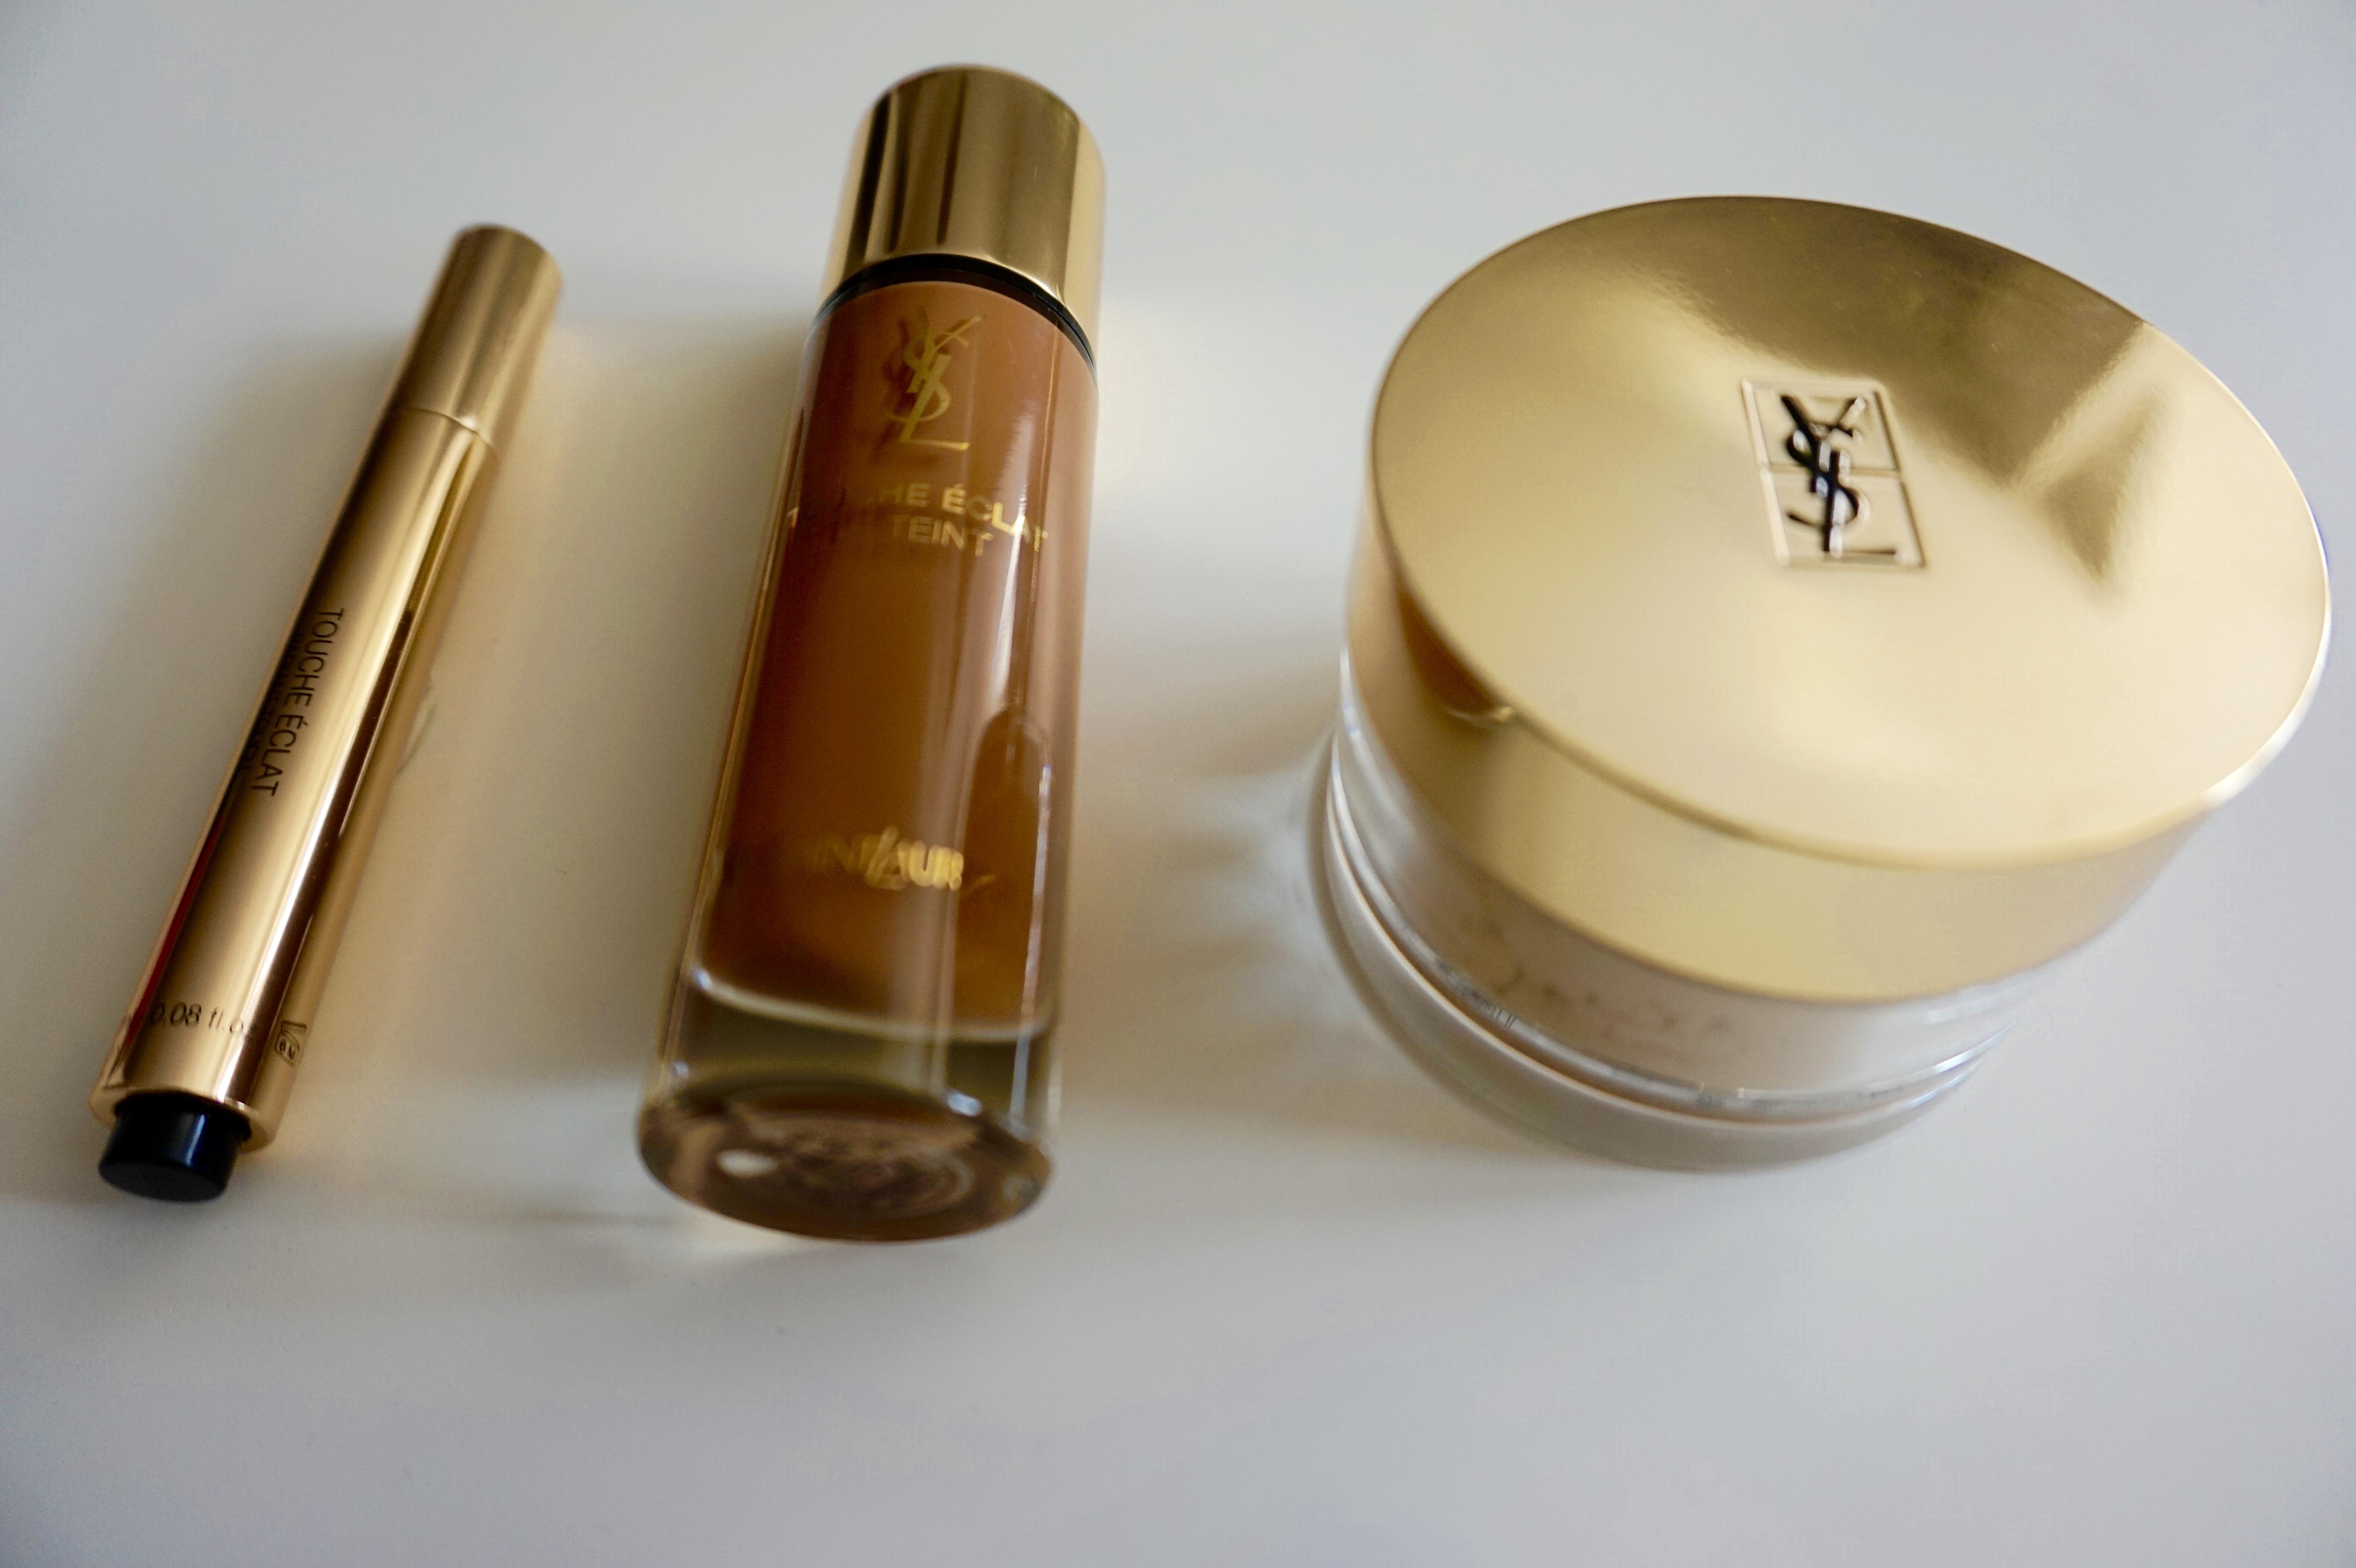 gold-ysl-beauty-yves-saint-laurent-beauty-haul-raychel-says